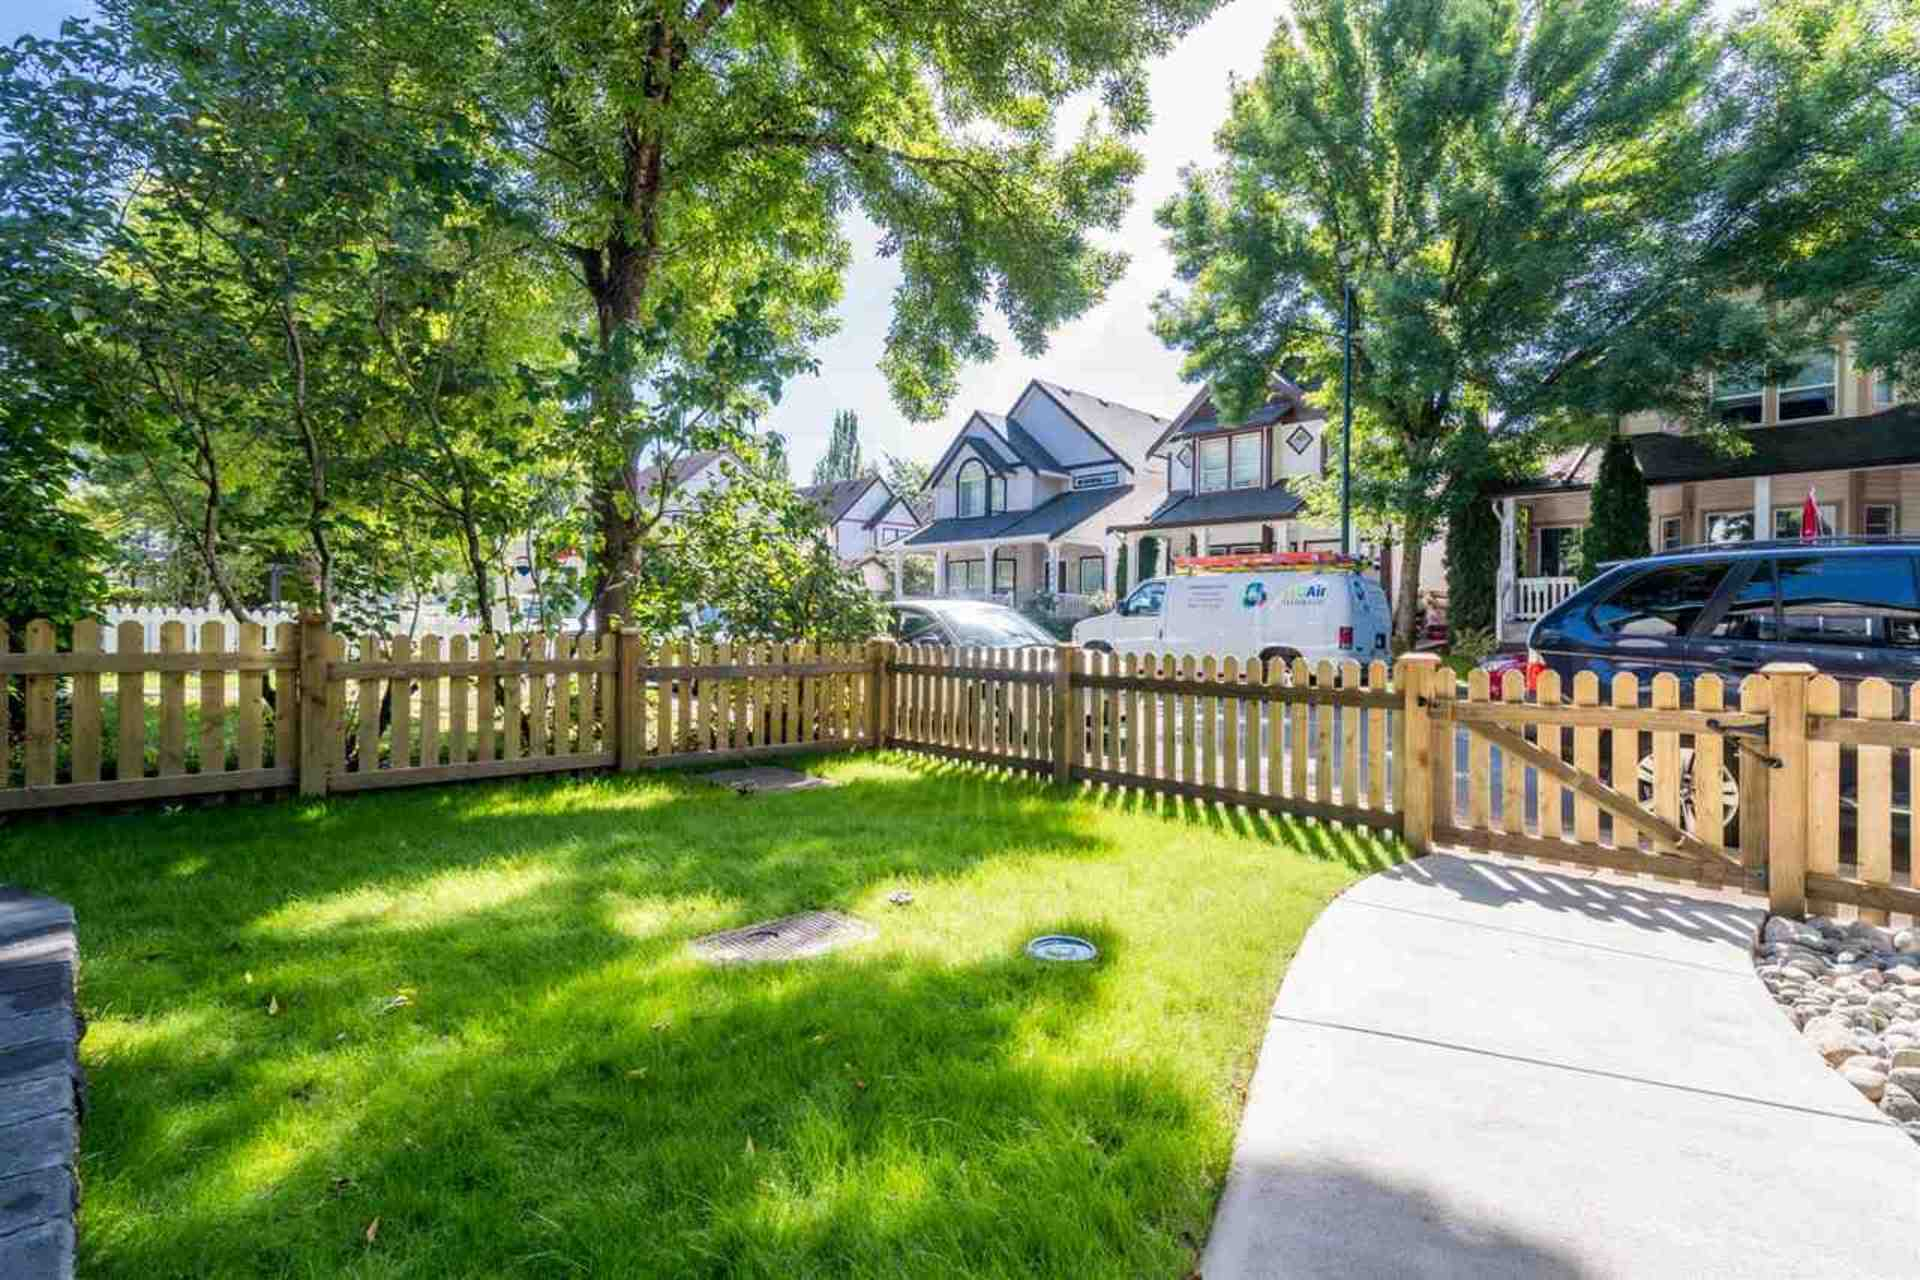 18477-66-avenue-cloverdale-bc-cloverdale-03 at 18477 66 Avenue, Cloverdale BC, Cloverdale